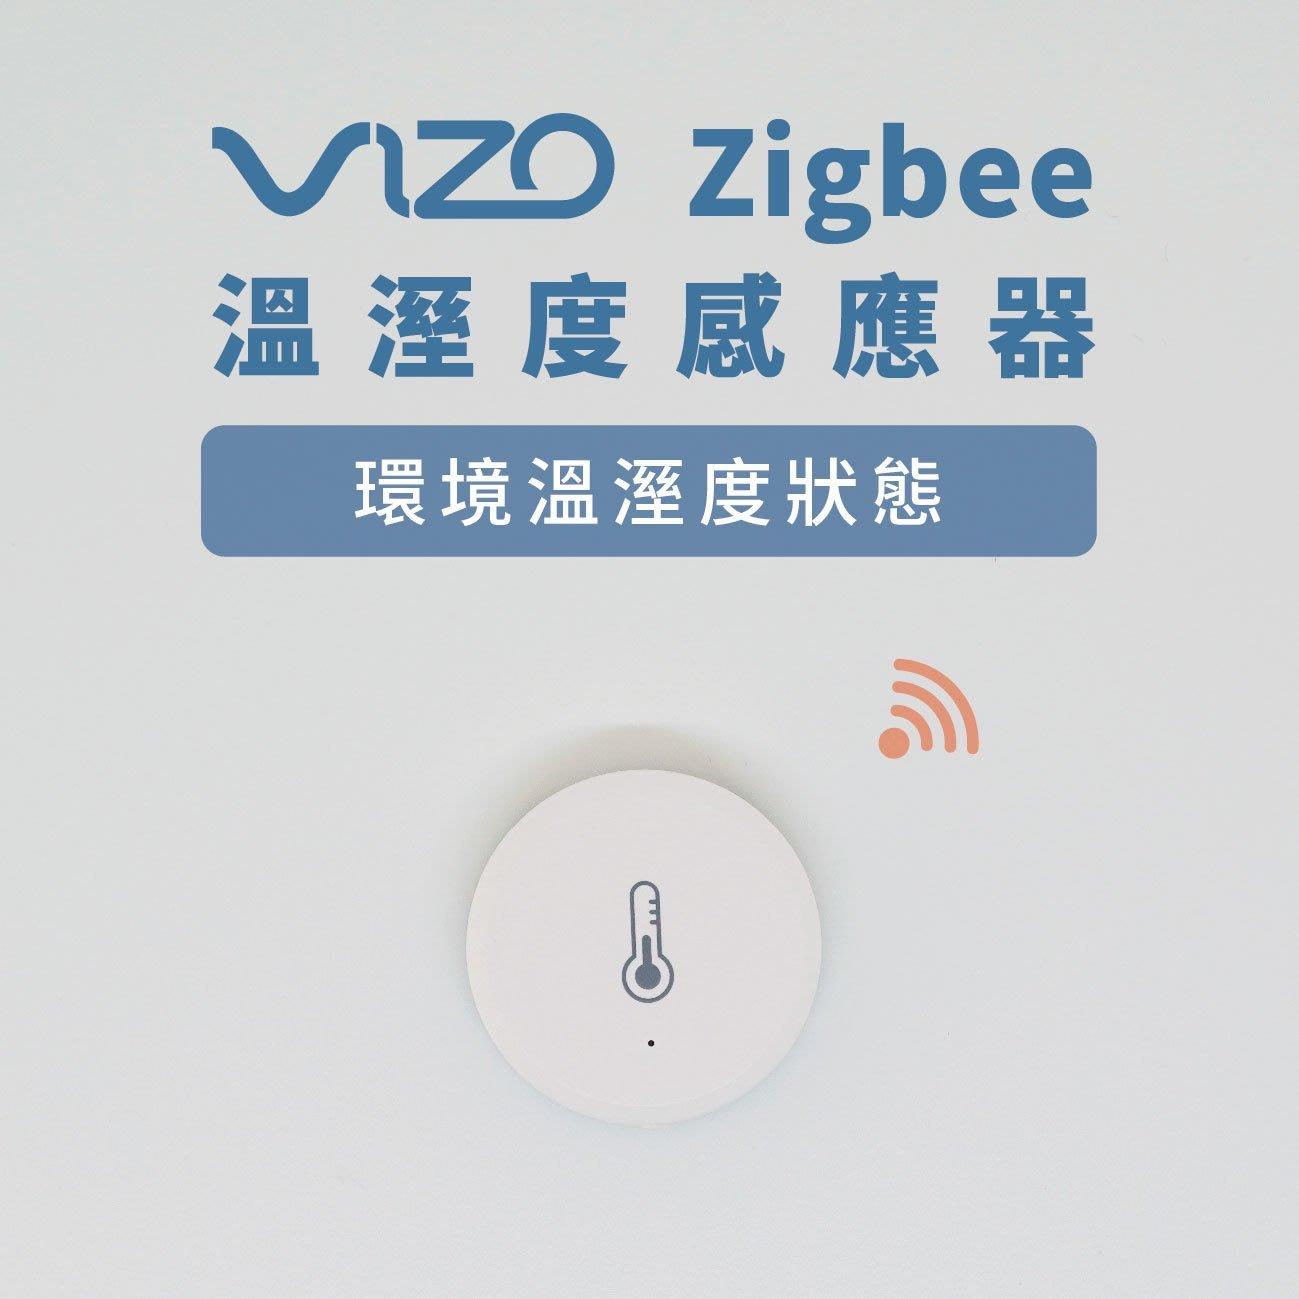 VIZO Zigbee溫溼度感應器 需搭配VIZO Zigbee網關使用